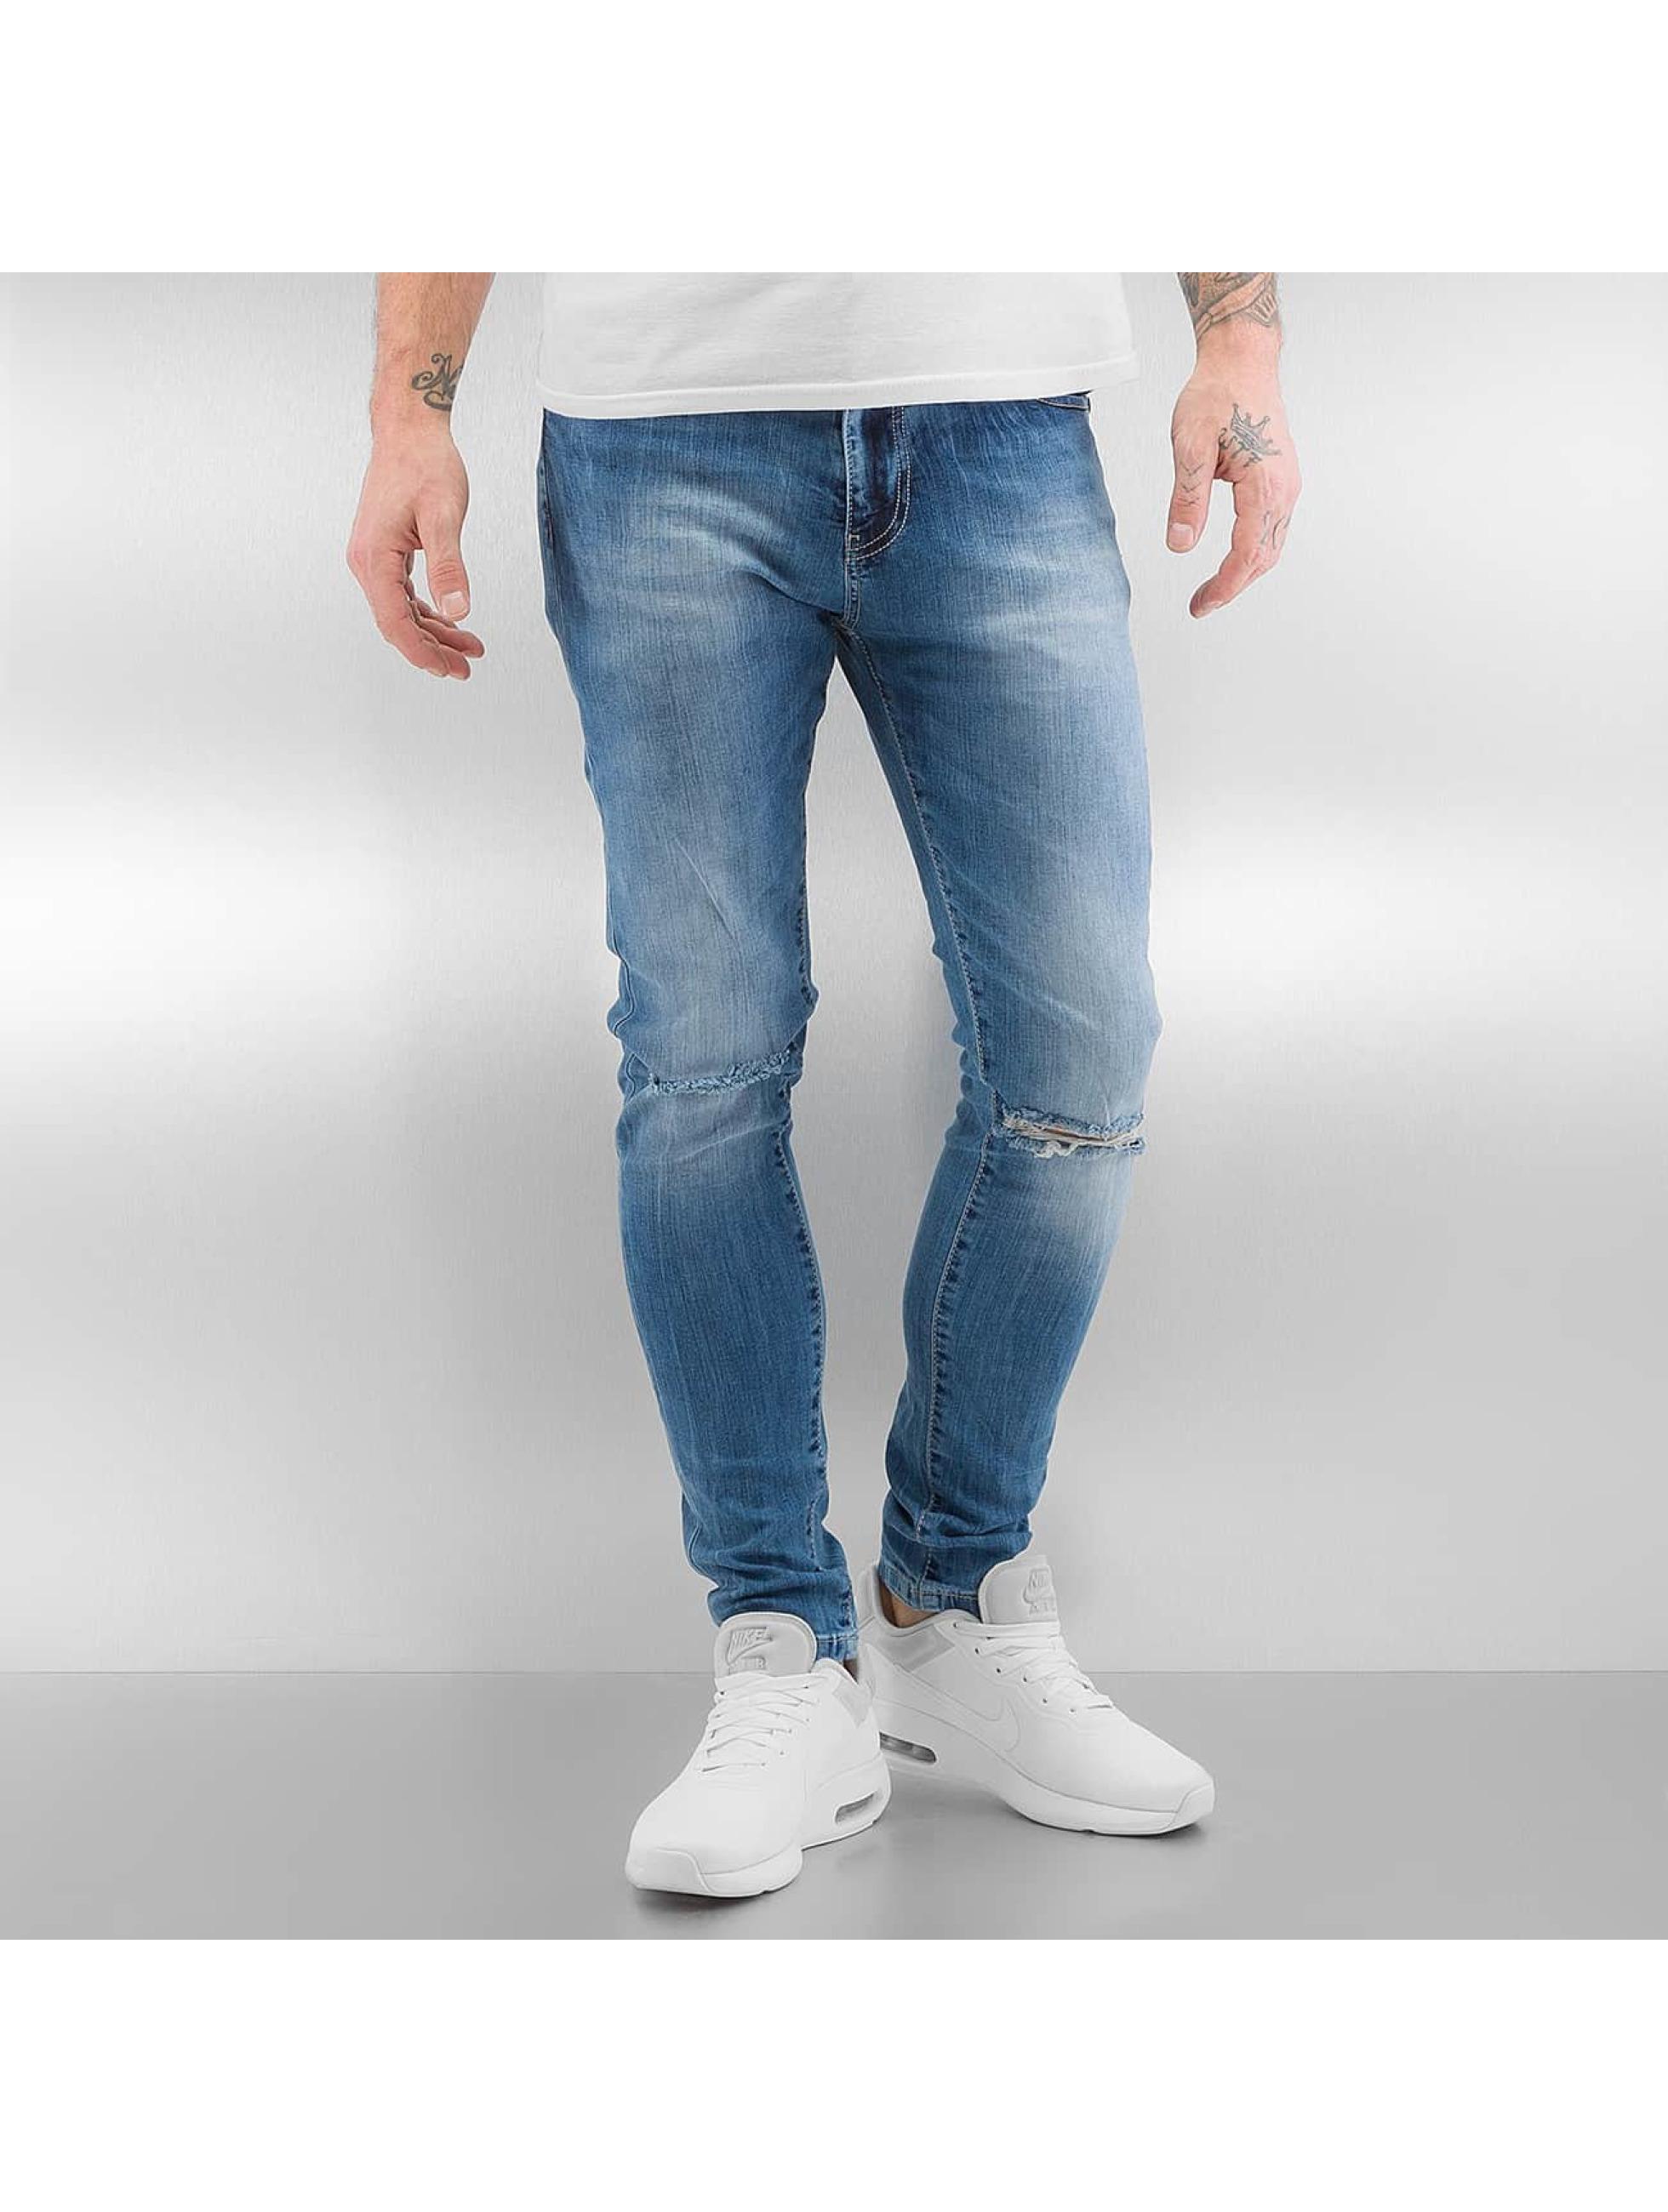 Skinny Jeans Yuta in blau